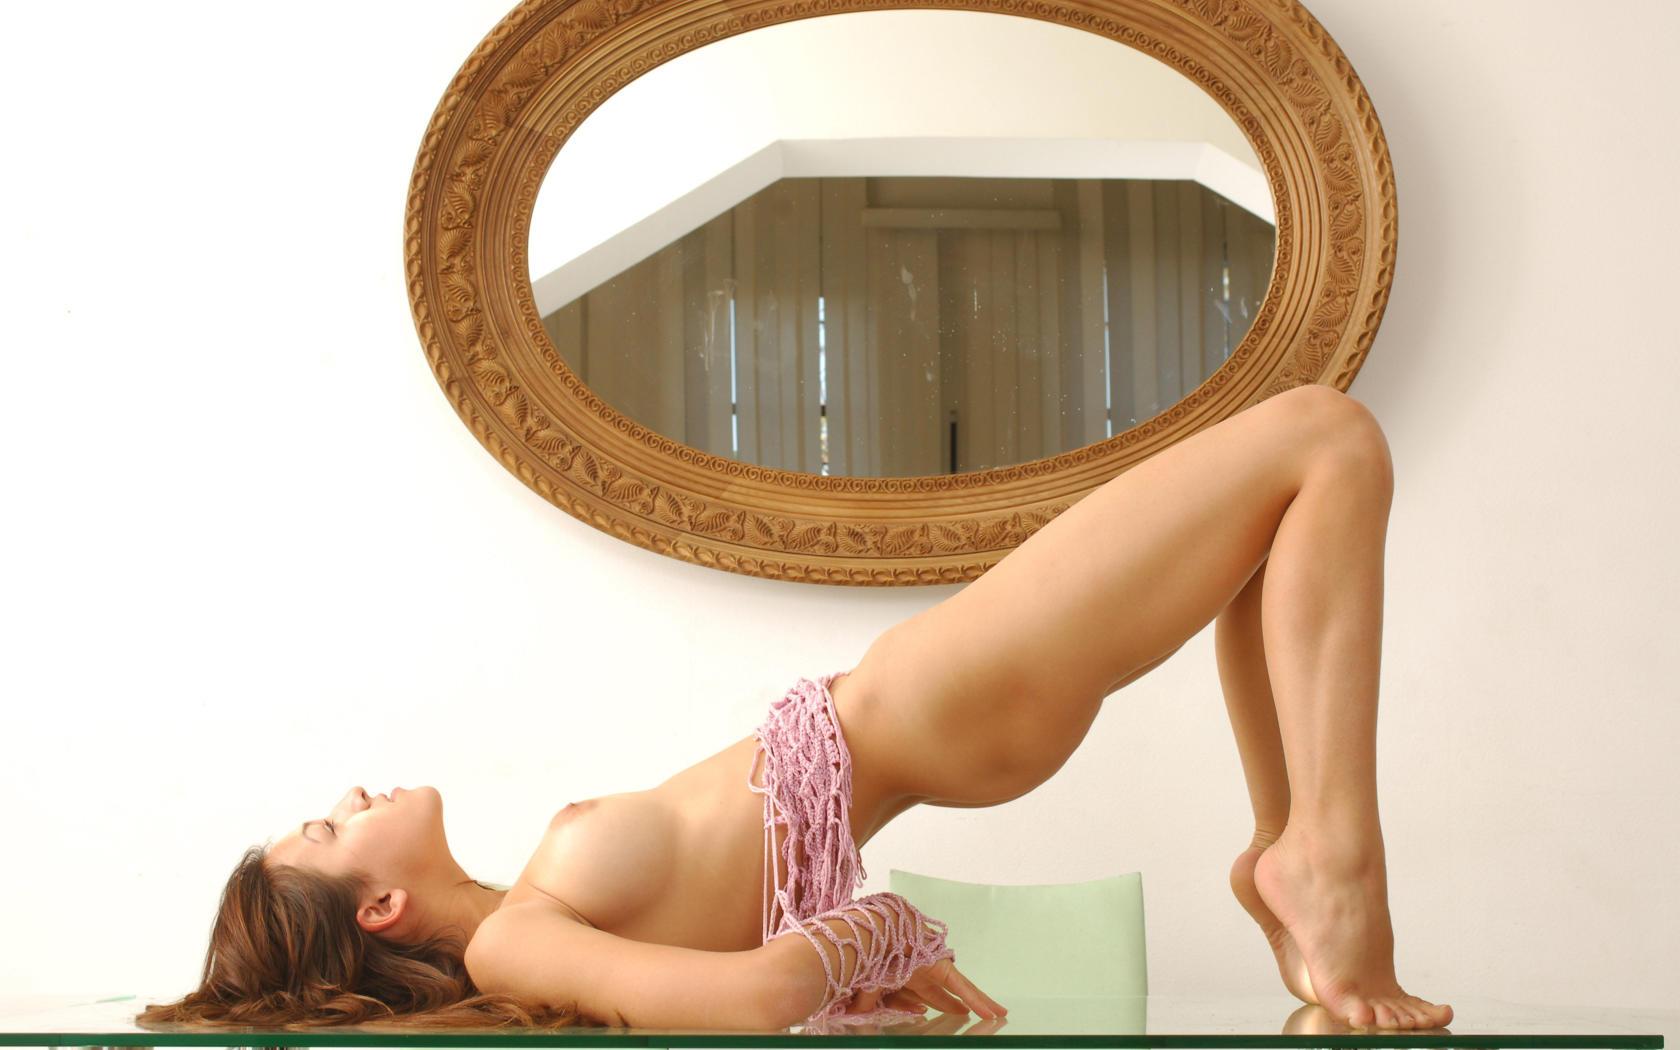 Download photo 1680x1050, sofi a, brunette, sexy girl ...